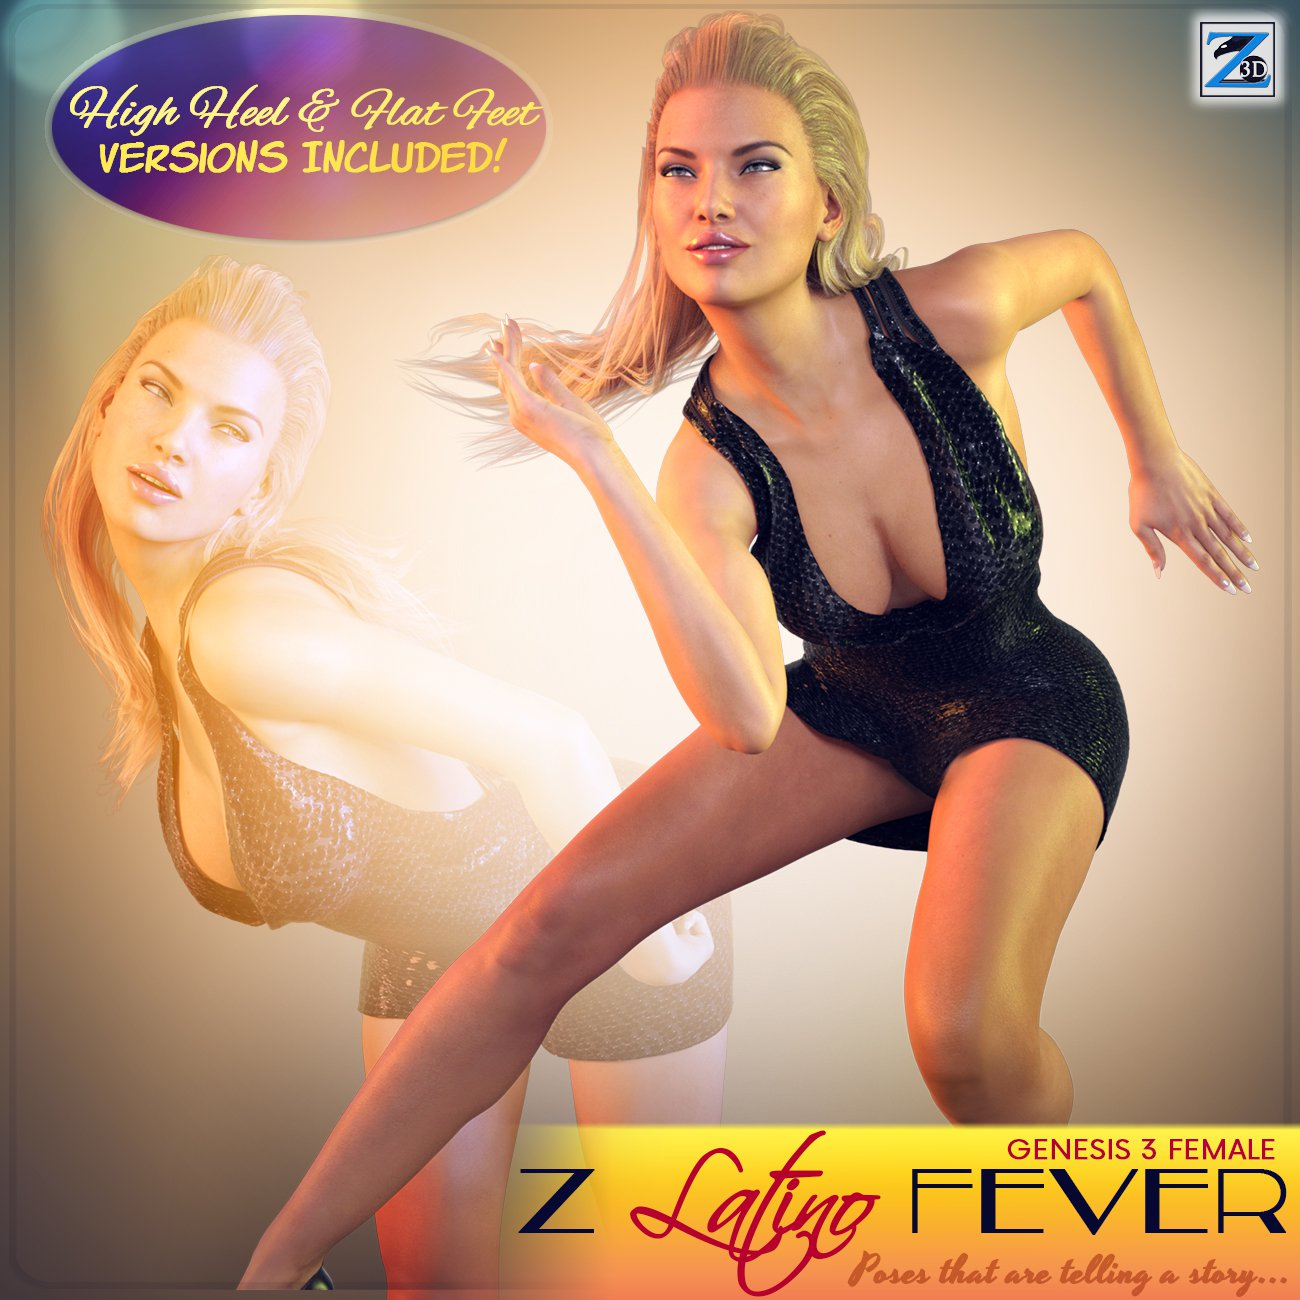 Z Latino Fever – Poses for the Genesis 3 Female(s)_DAZ3D下载站